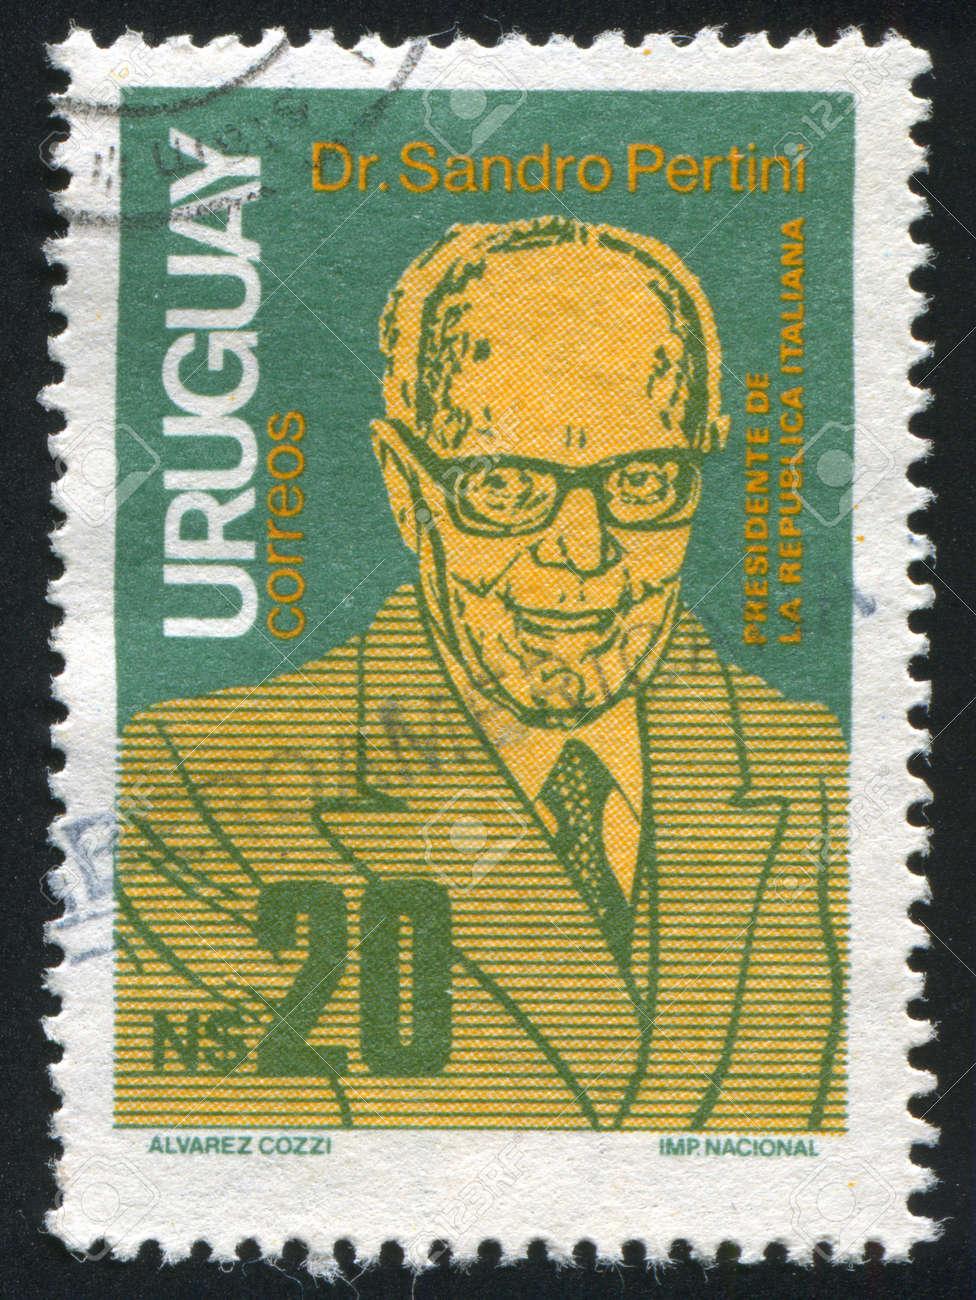 URUGUAY - CIRCA 1986: stamp printed by Uruguay, shows State Visit of President Sandro Pertini of Italy, circa 1986 Stock Photo - 14137018